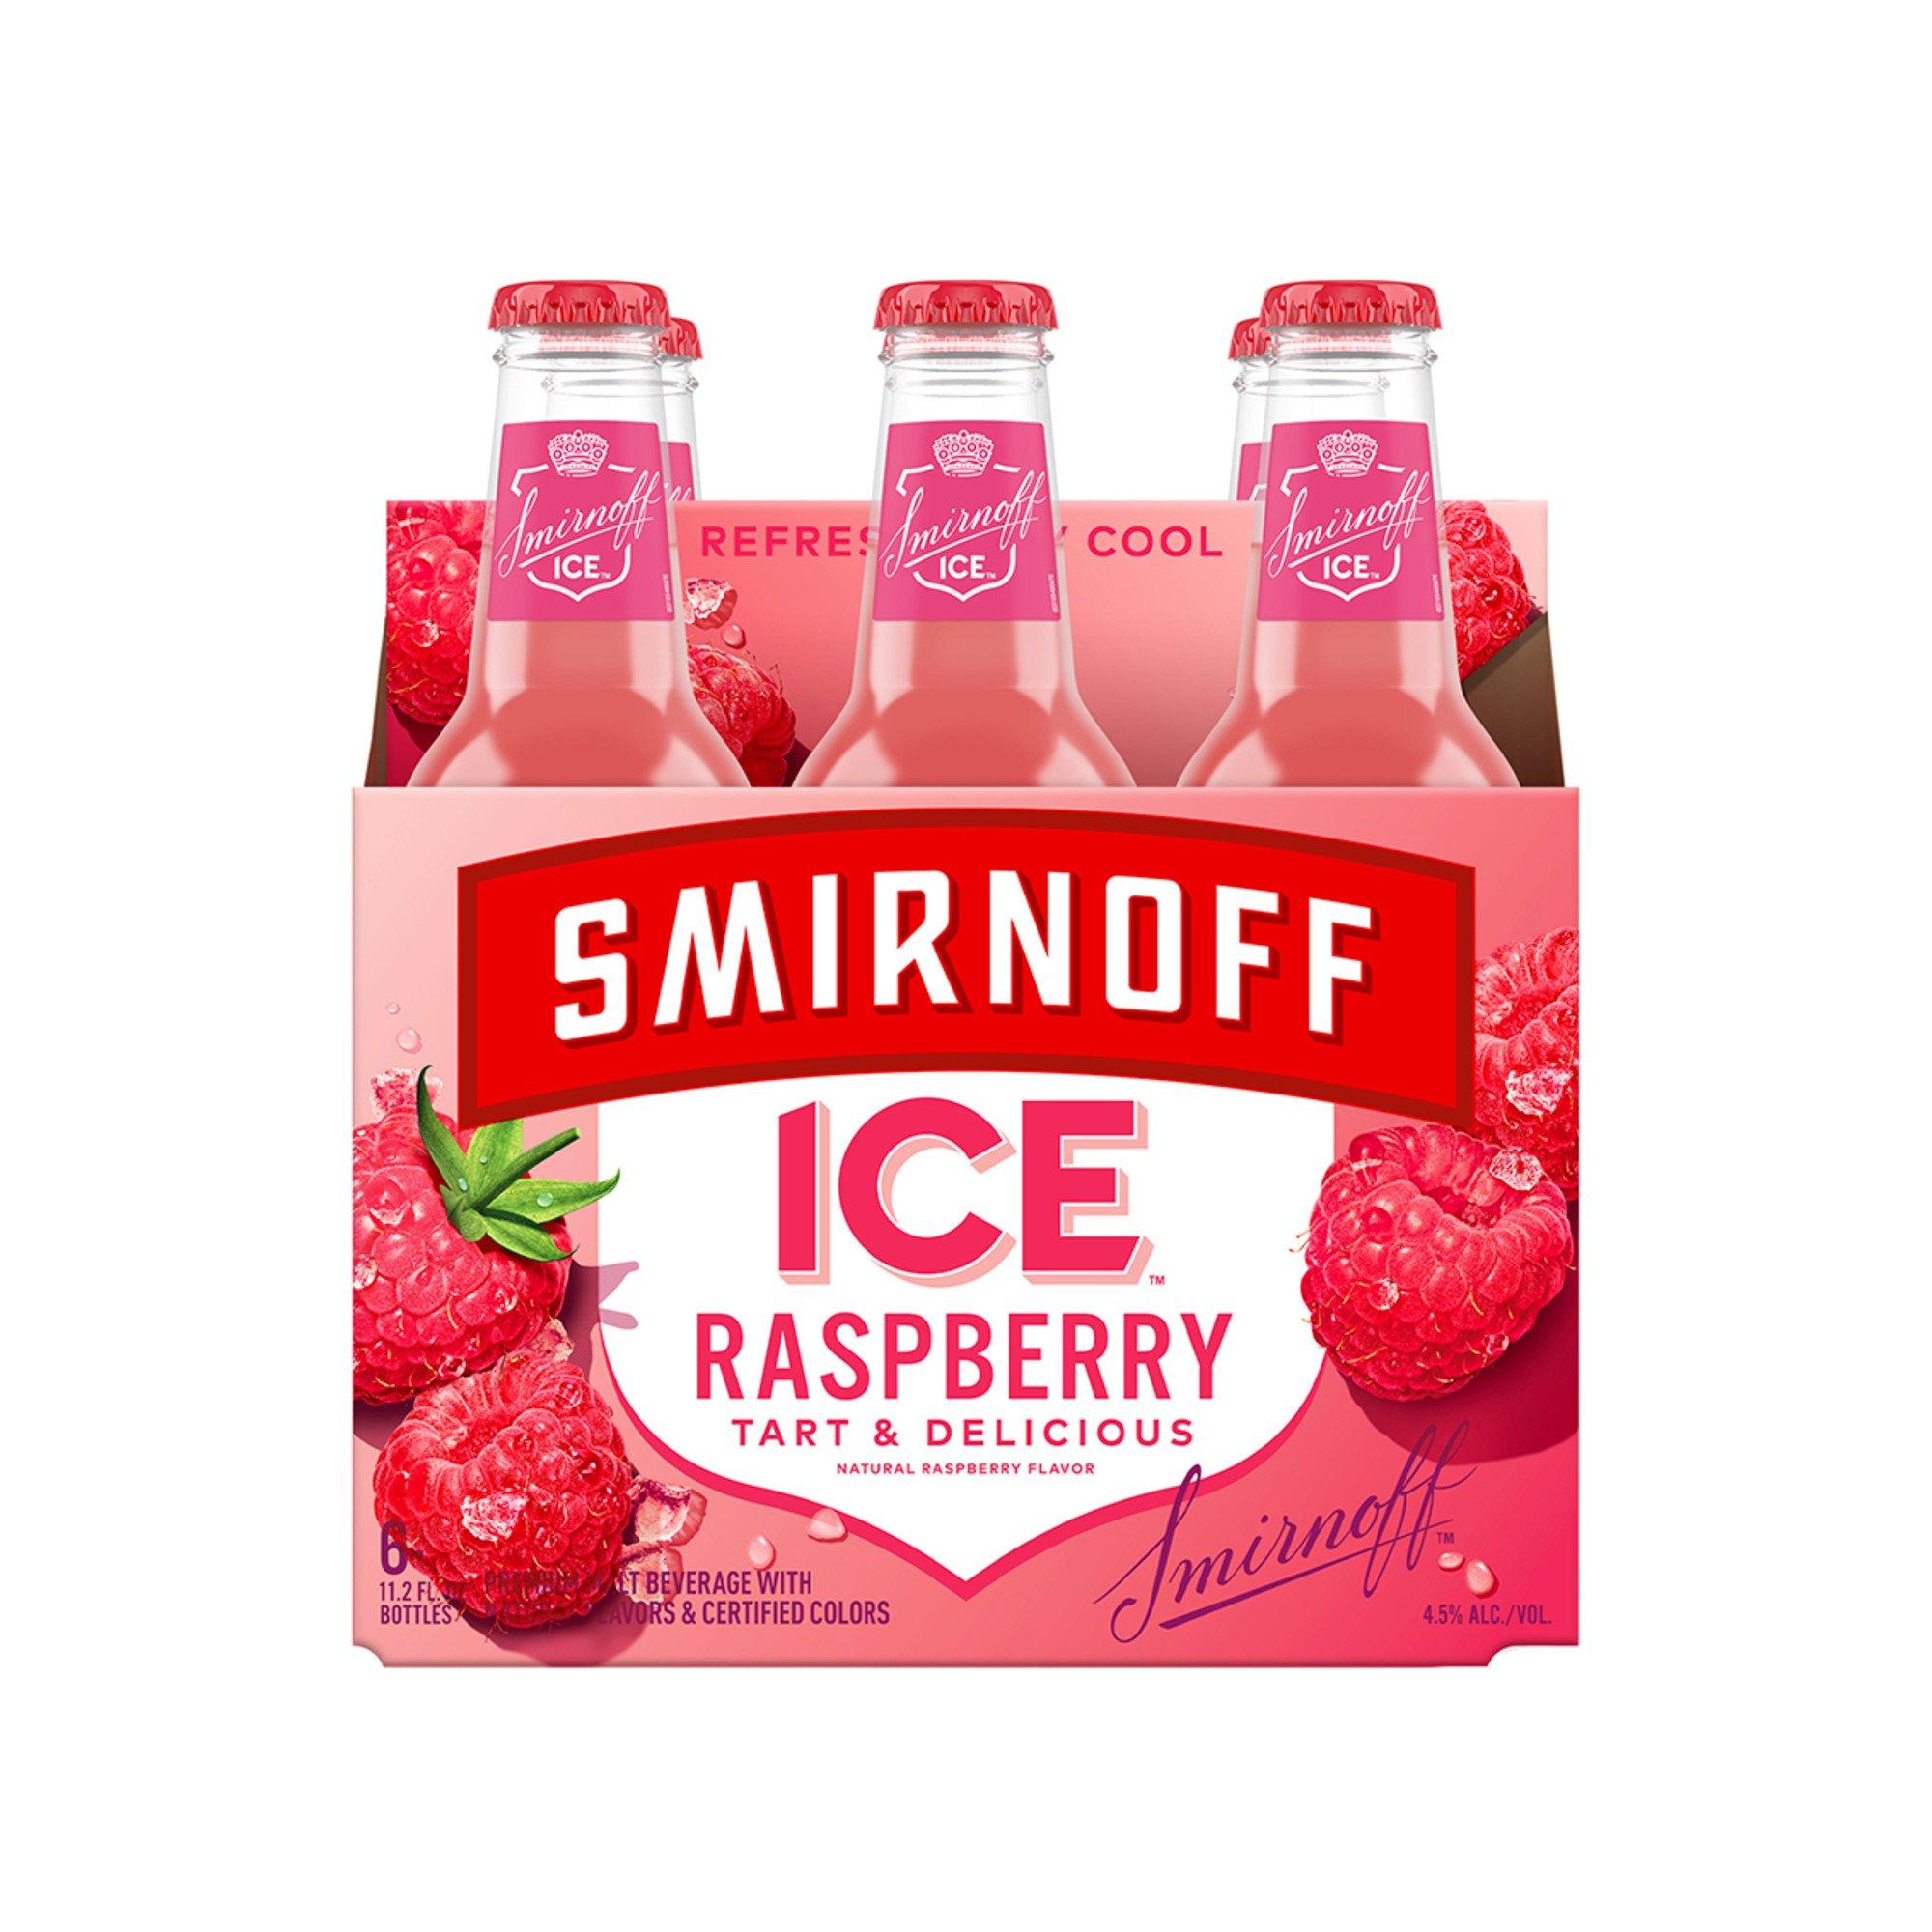 Smirnoff Ice - Cranberry Lime Splash- 11.2oz Bottle - 6